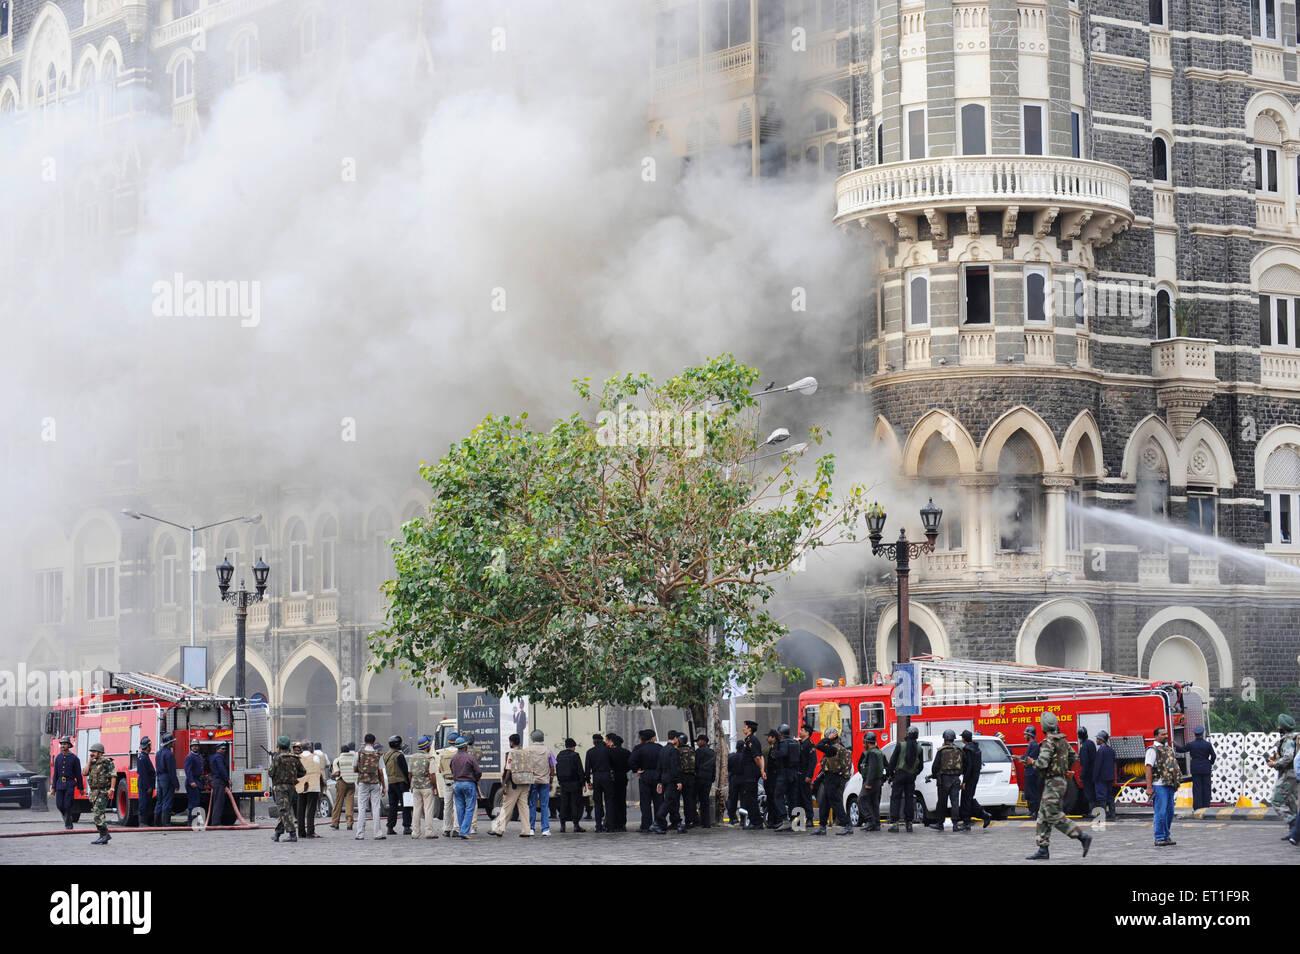 Fire Brigade trying extinguish fire wing Taj Mahal hotel ; terrorist attack Deccan Mujahedeen 26th November 2008 - Stock Image